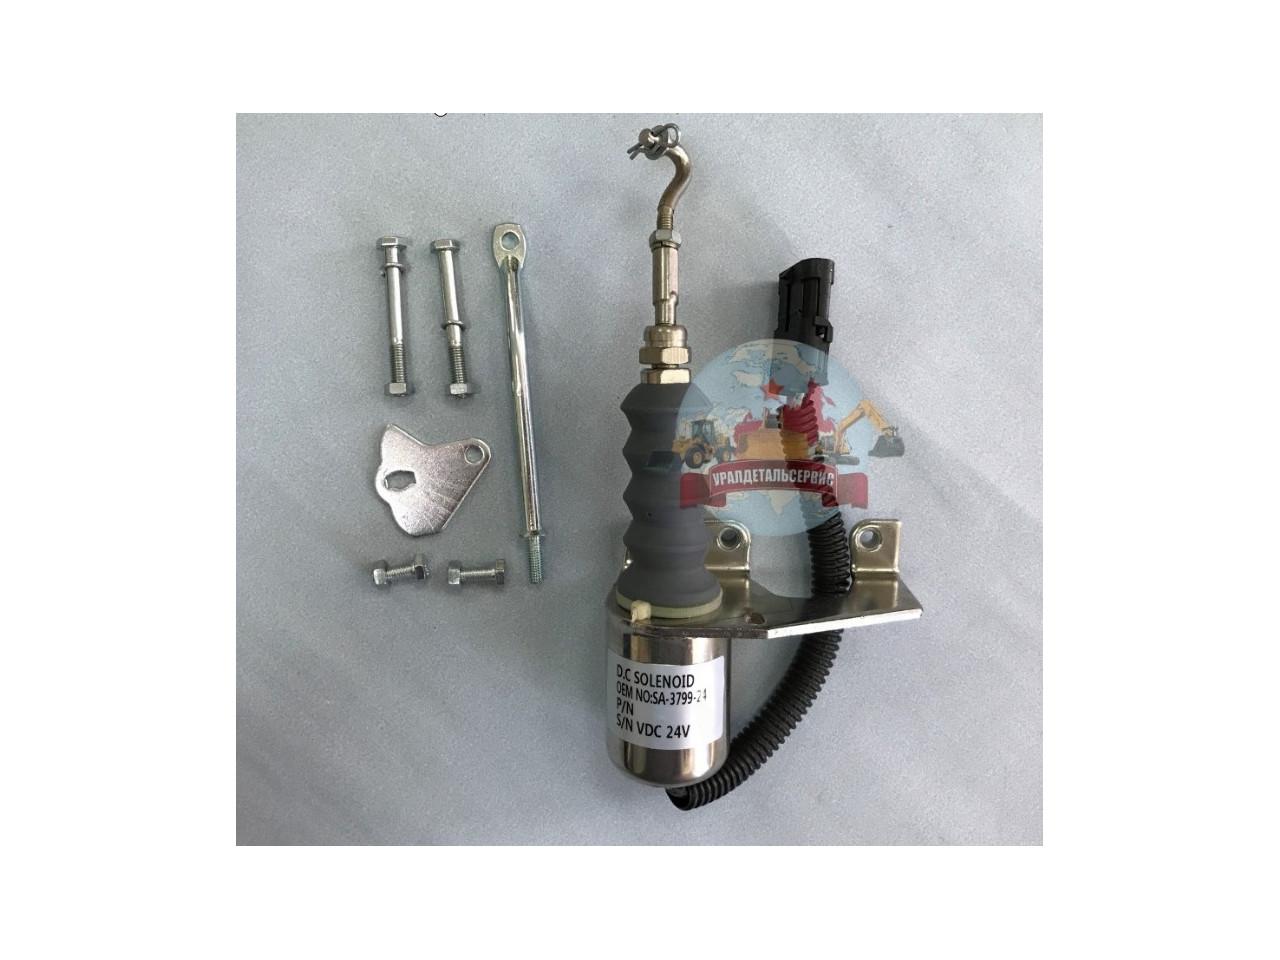 Соленоид 1751ES 24V SA-3799-24 6290050